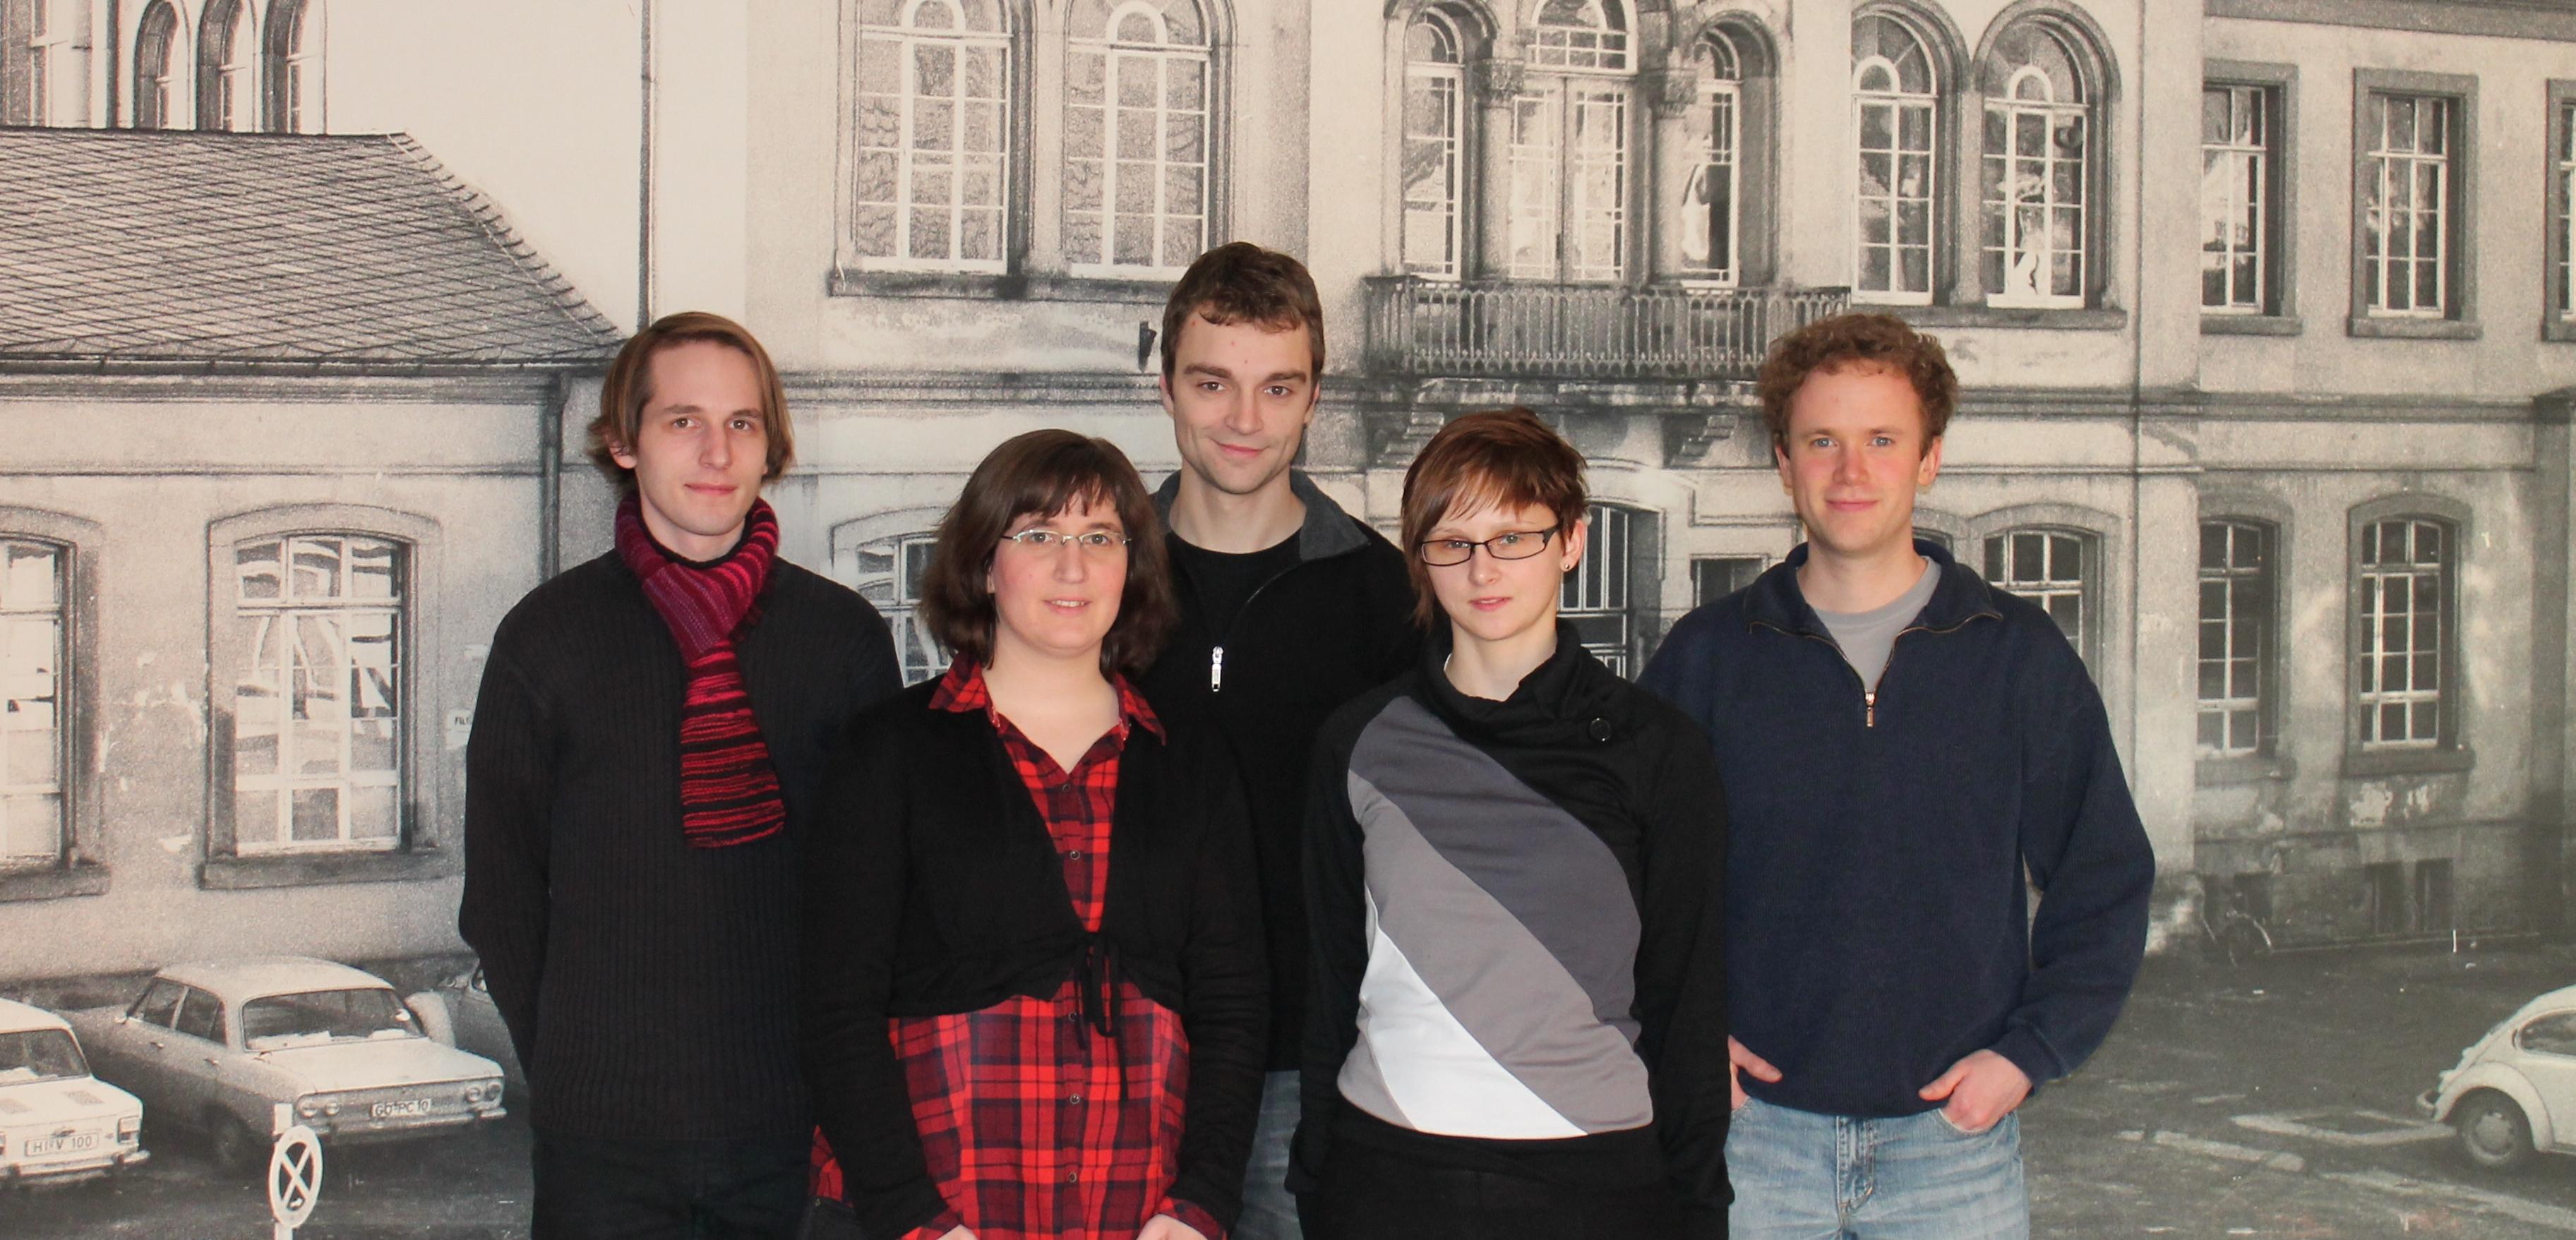 Nico Graw, Cornelia Panse, Dennis Hübner, Sabrina Freye, David Engelhard (from left)